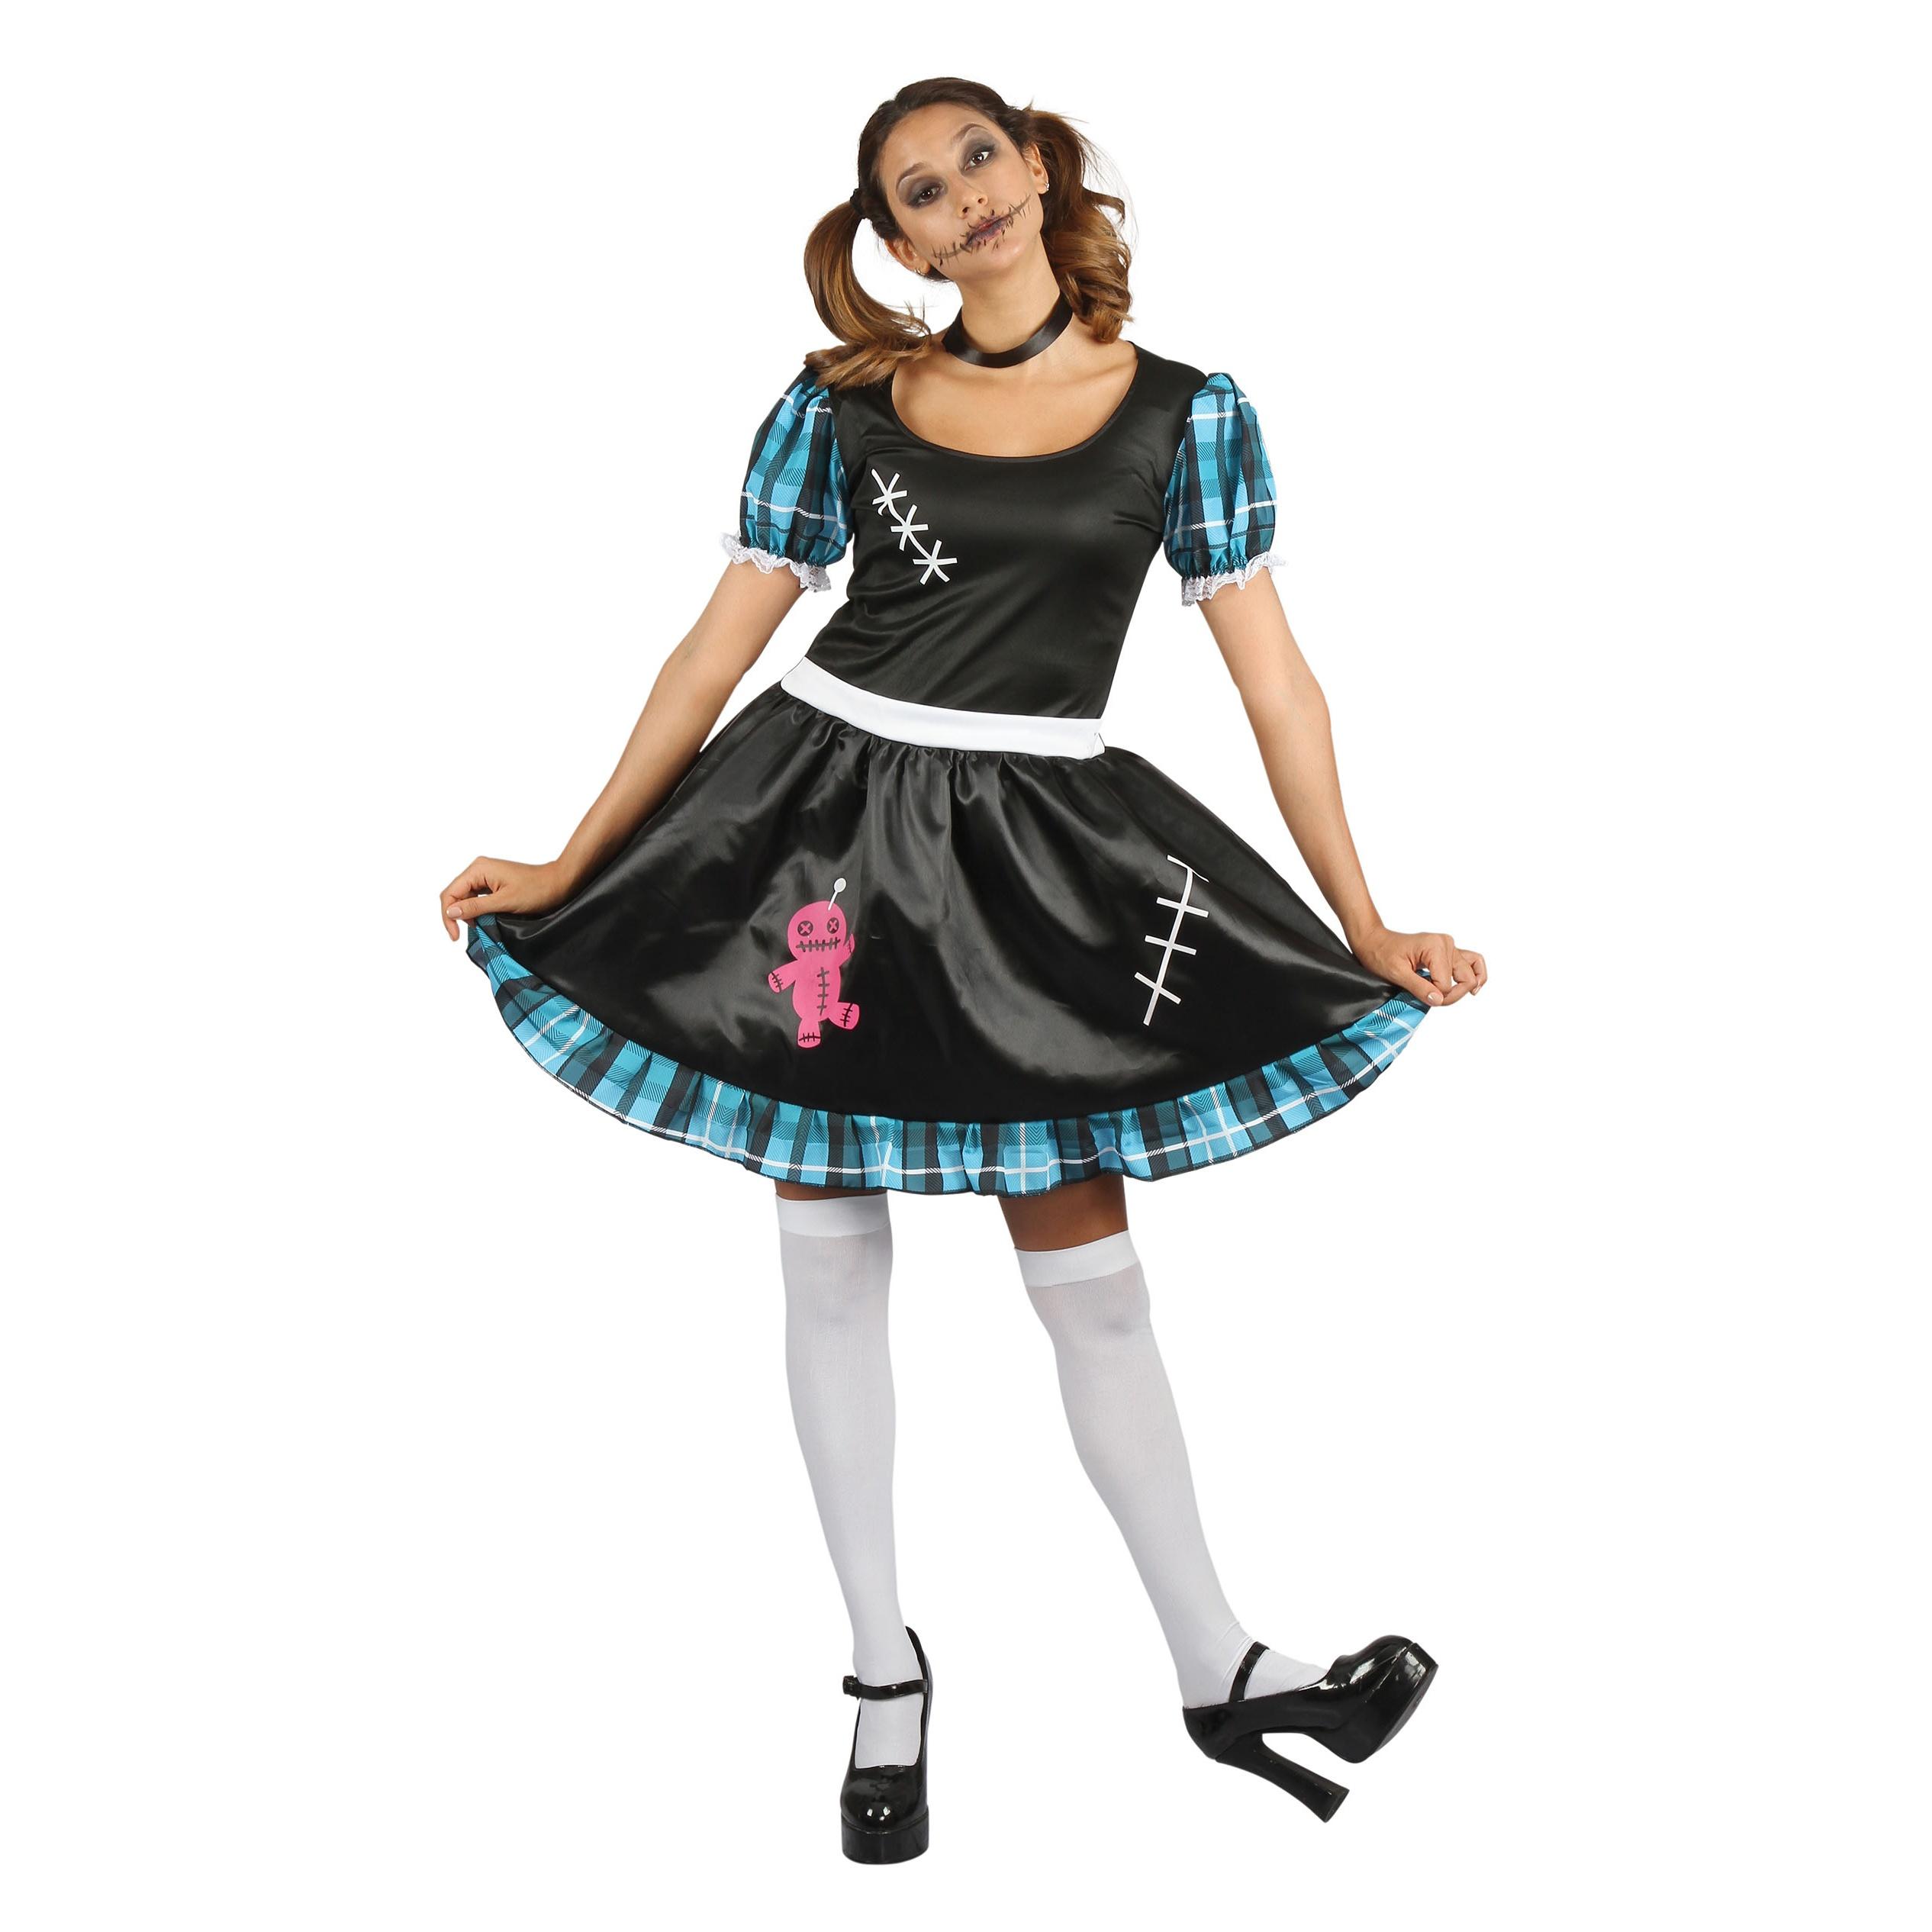 Bristol Novelty Womens/Ladies Voodoo Costume (One Size) (Blue/Black/White)